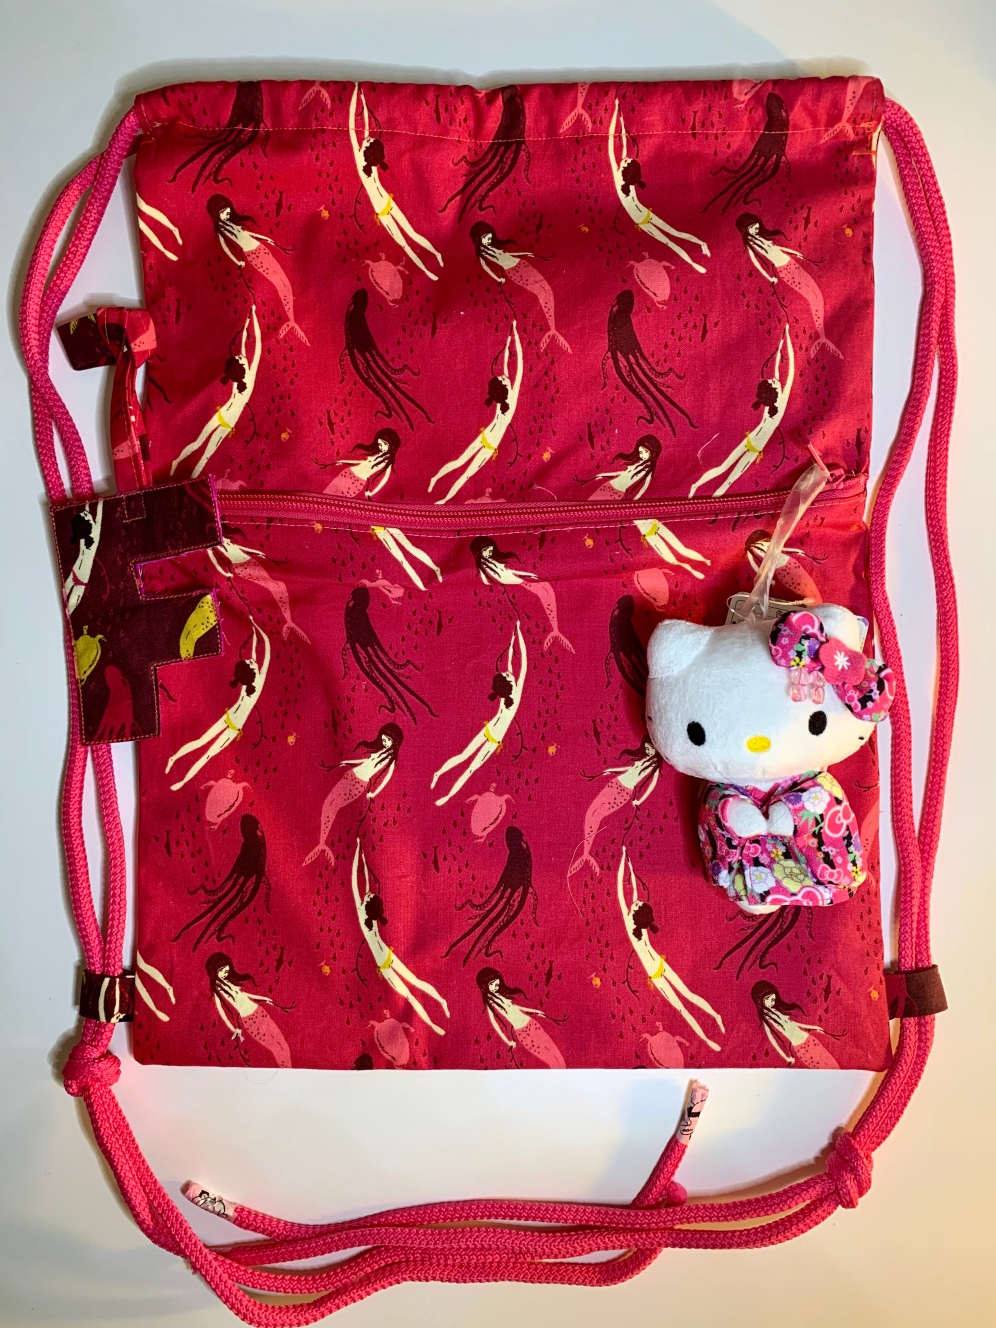 Child's swimming bag